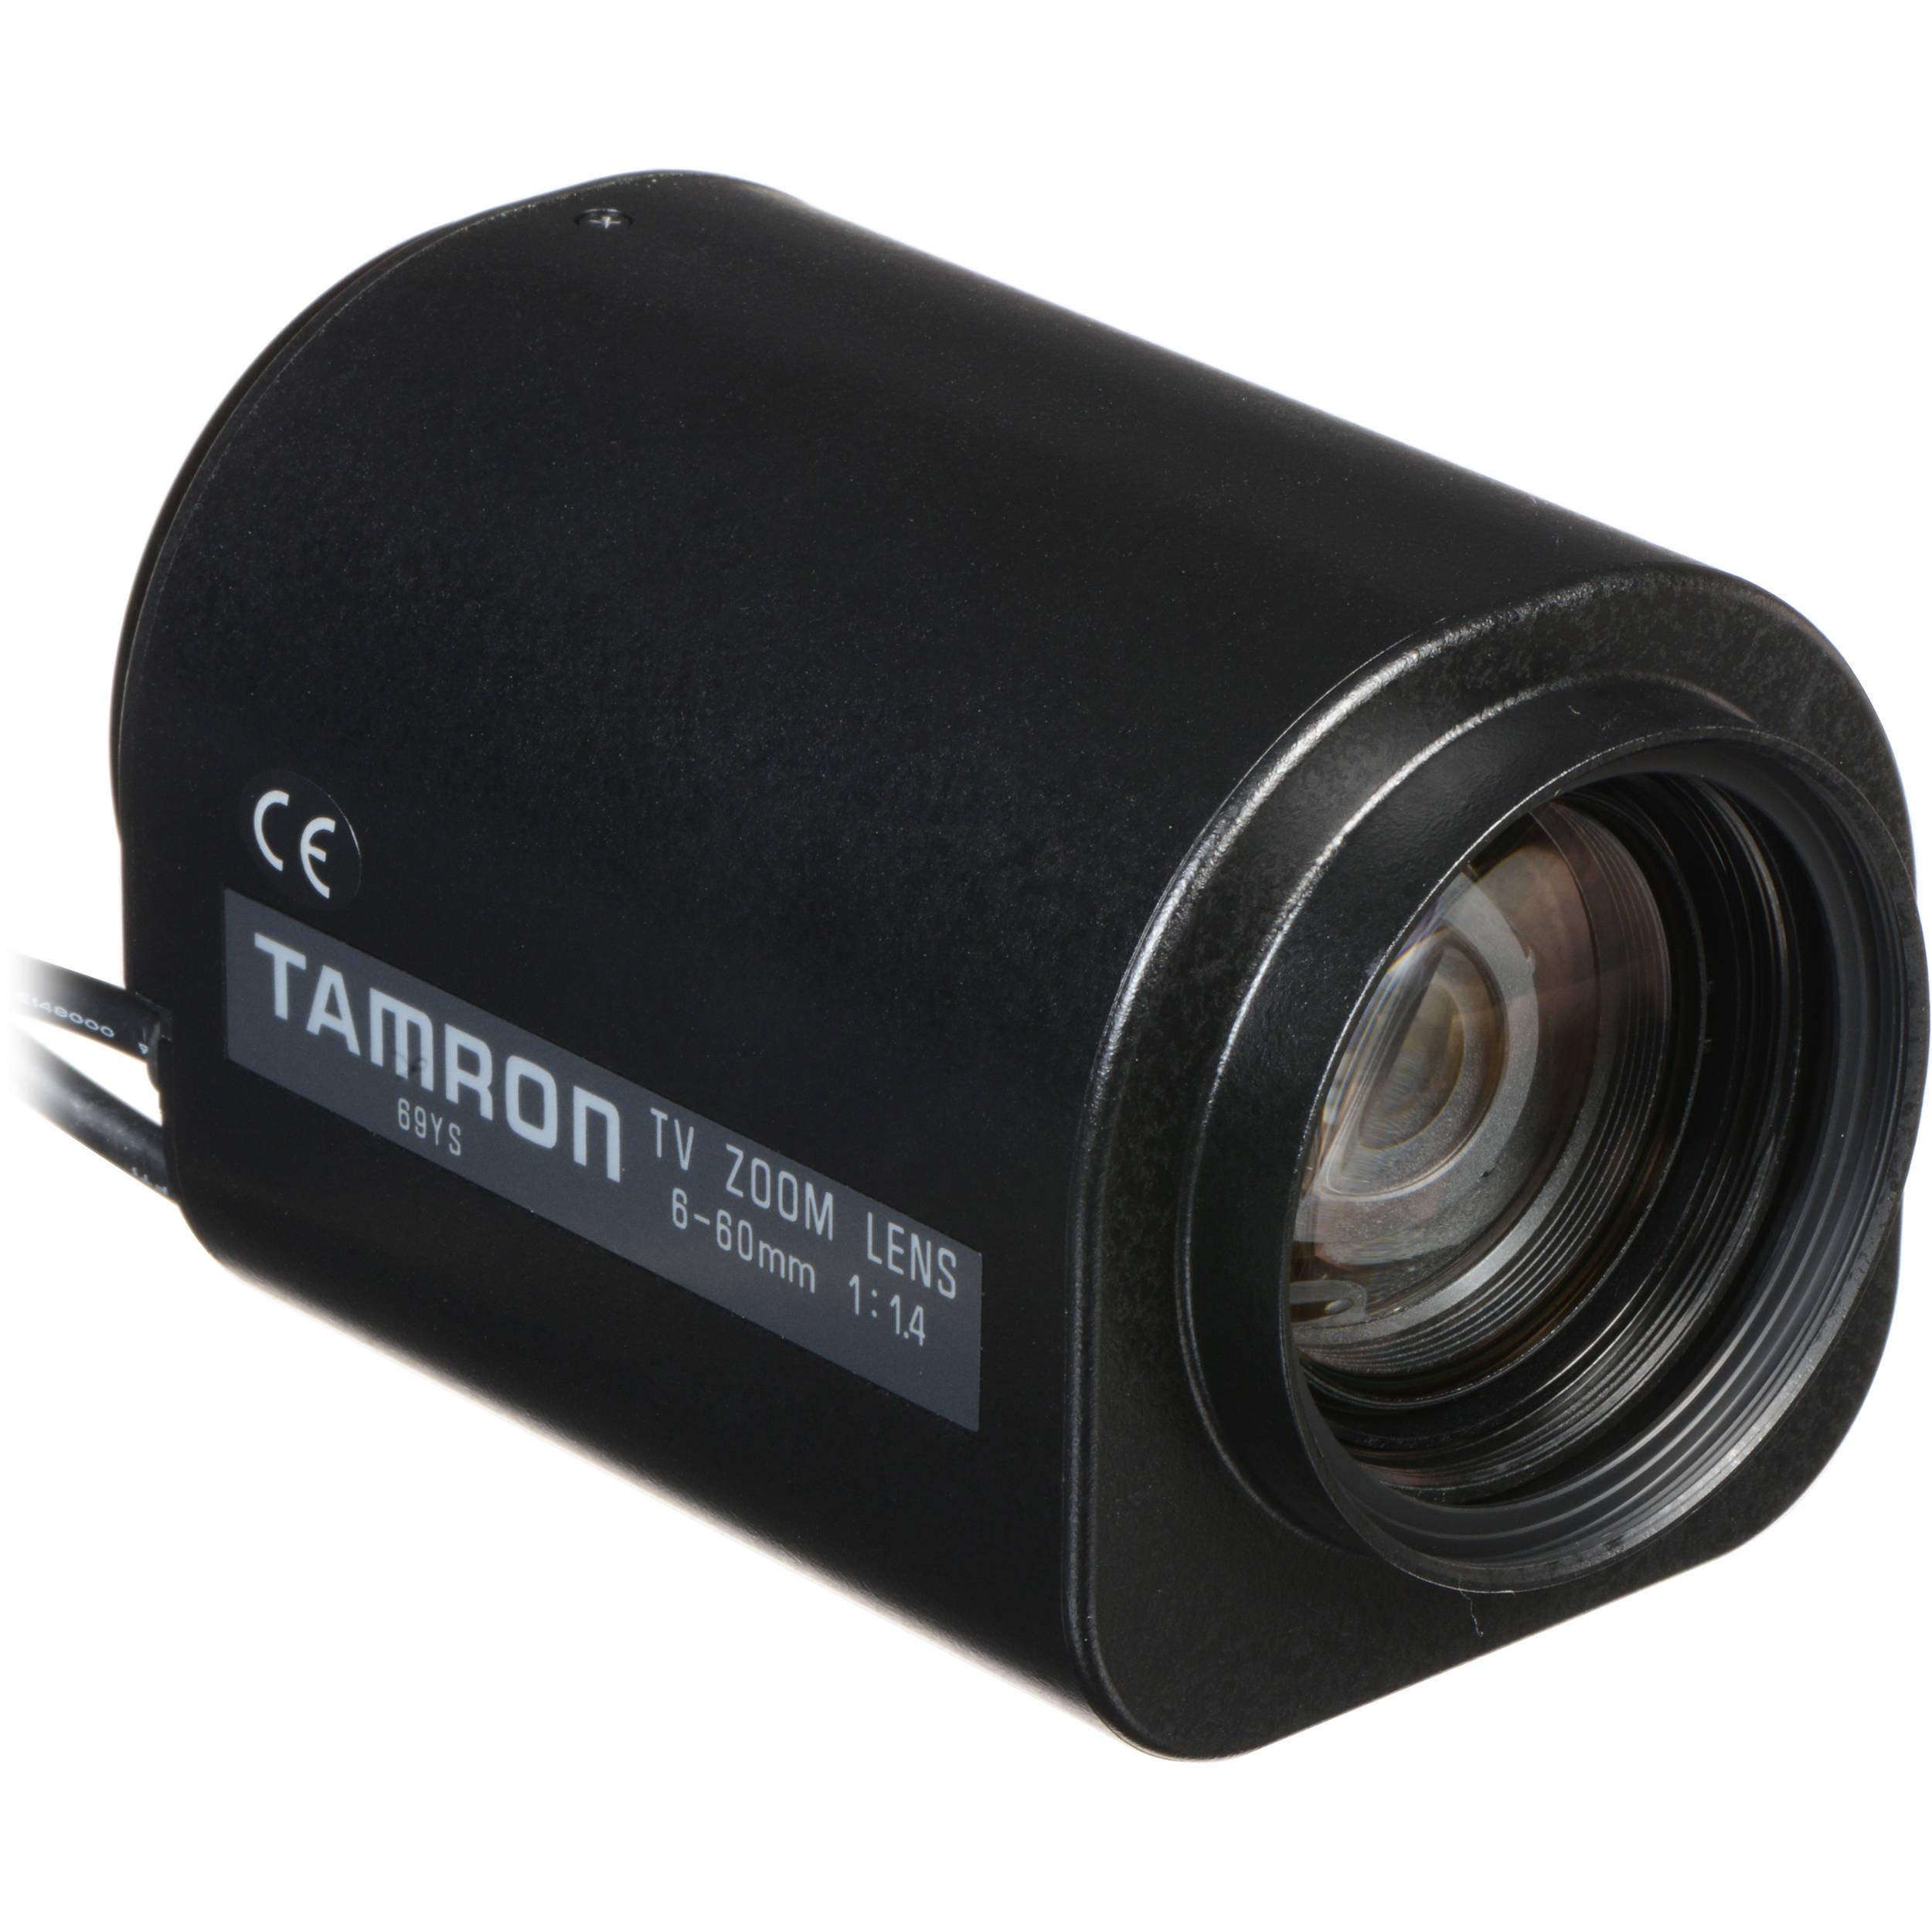 "Tamron 13PZG10X6C 1 3"" 6 60mm F 1 4 CS Mount pact Zoom Lens with Auto Iris DC"